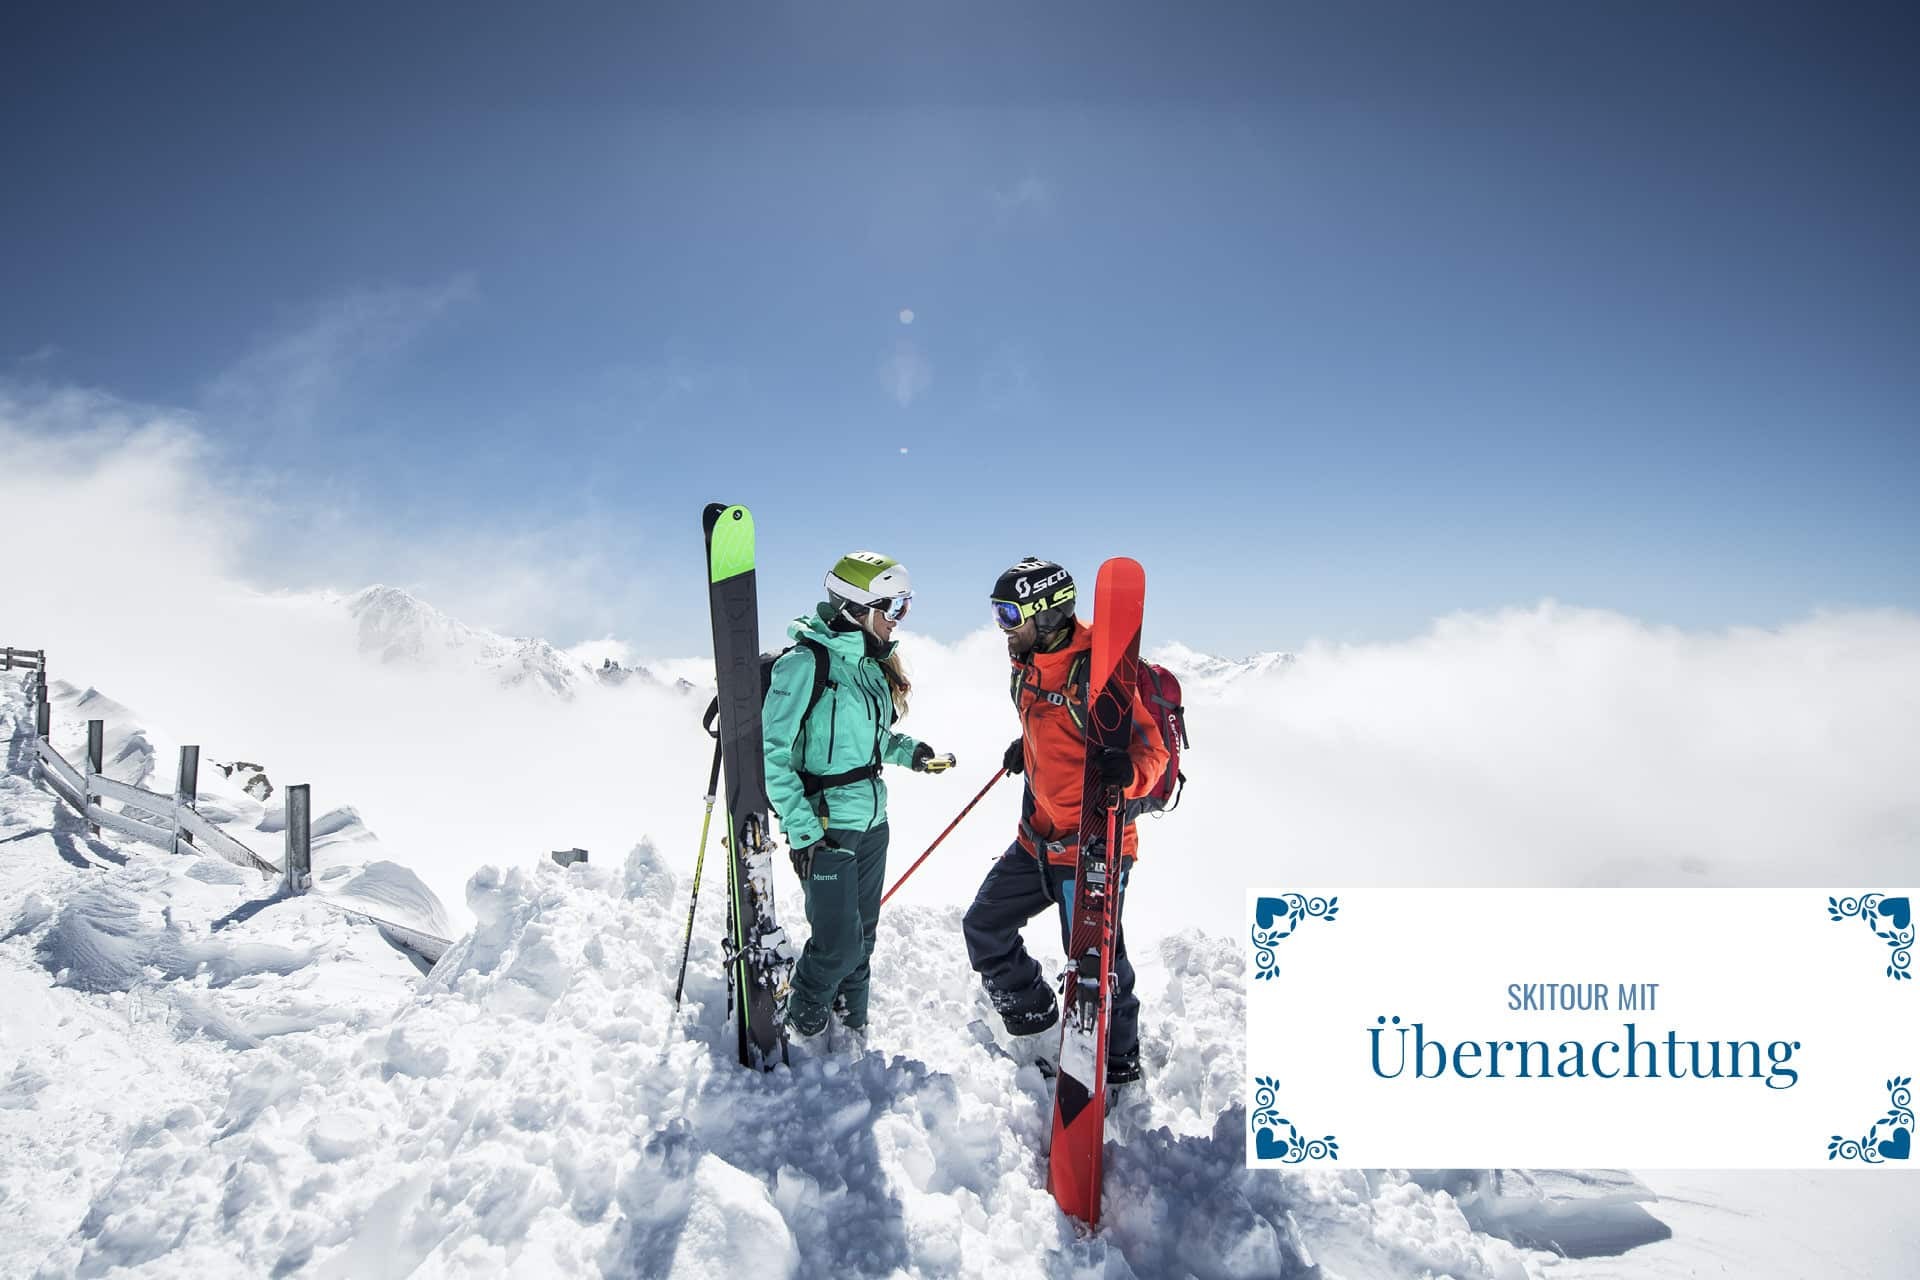 Sepp-und-Hannis-Stubaital-Winterhighlight-Skitour-Aktivurlaub-Tirol